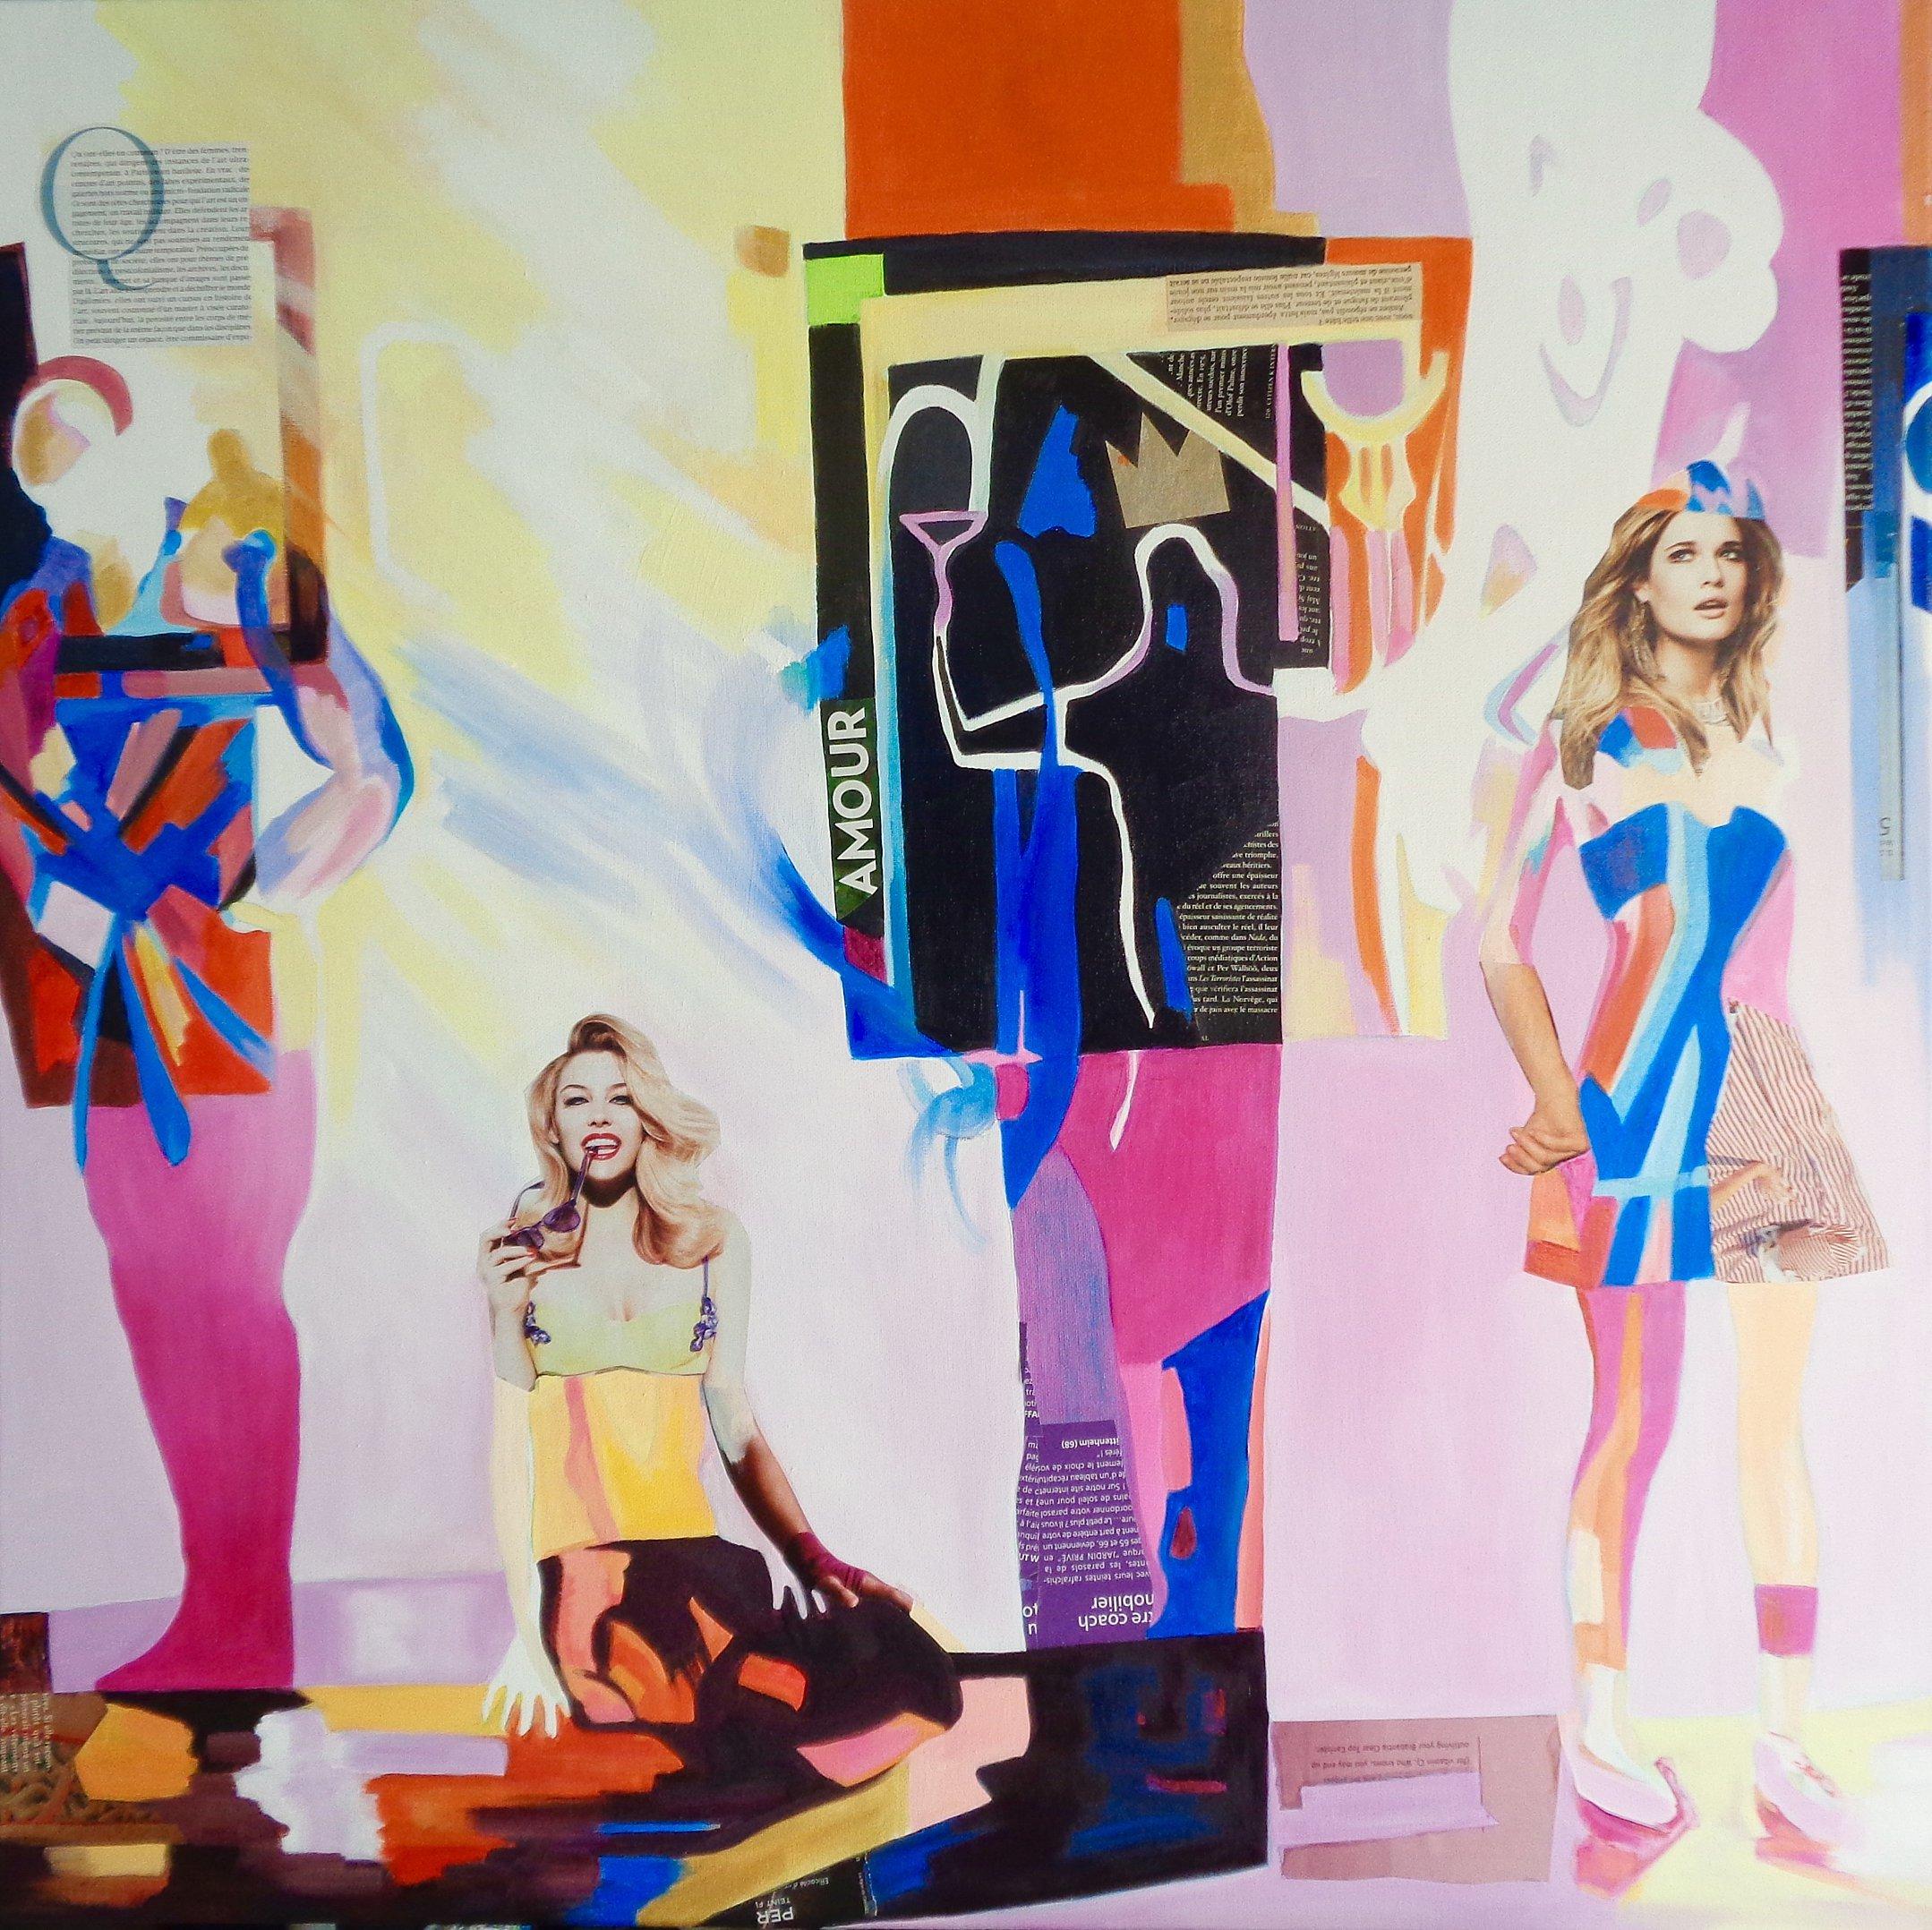 Gallery Girls 100x100 mixed media